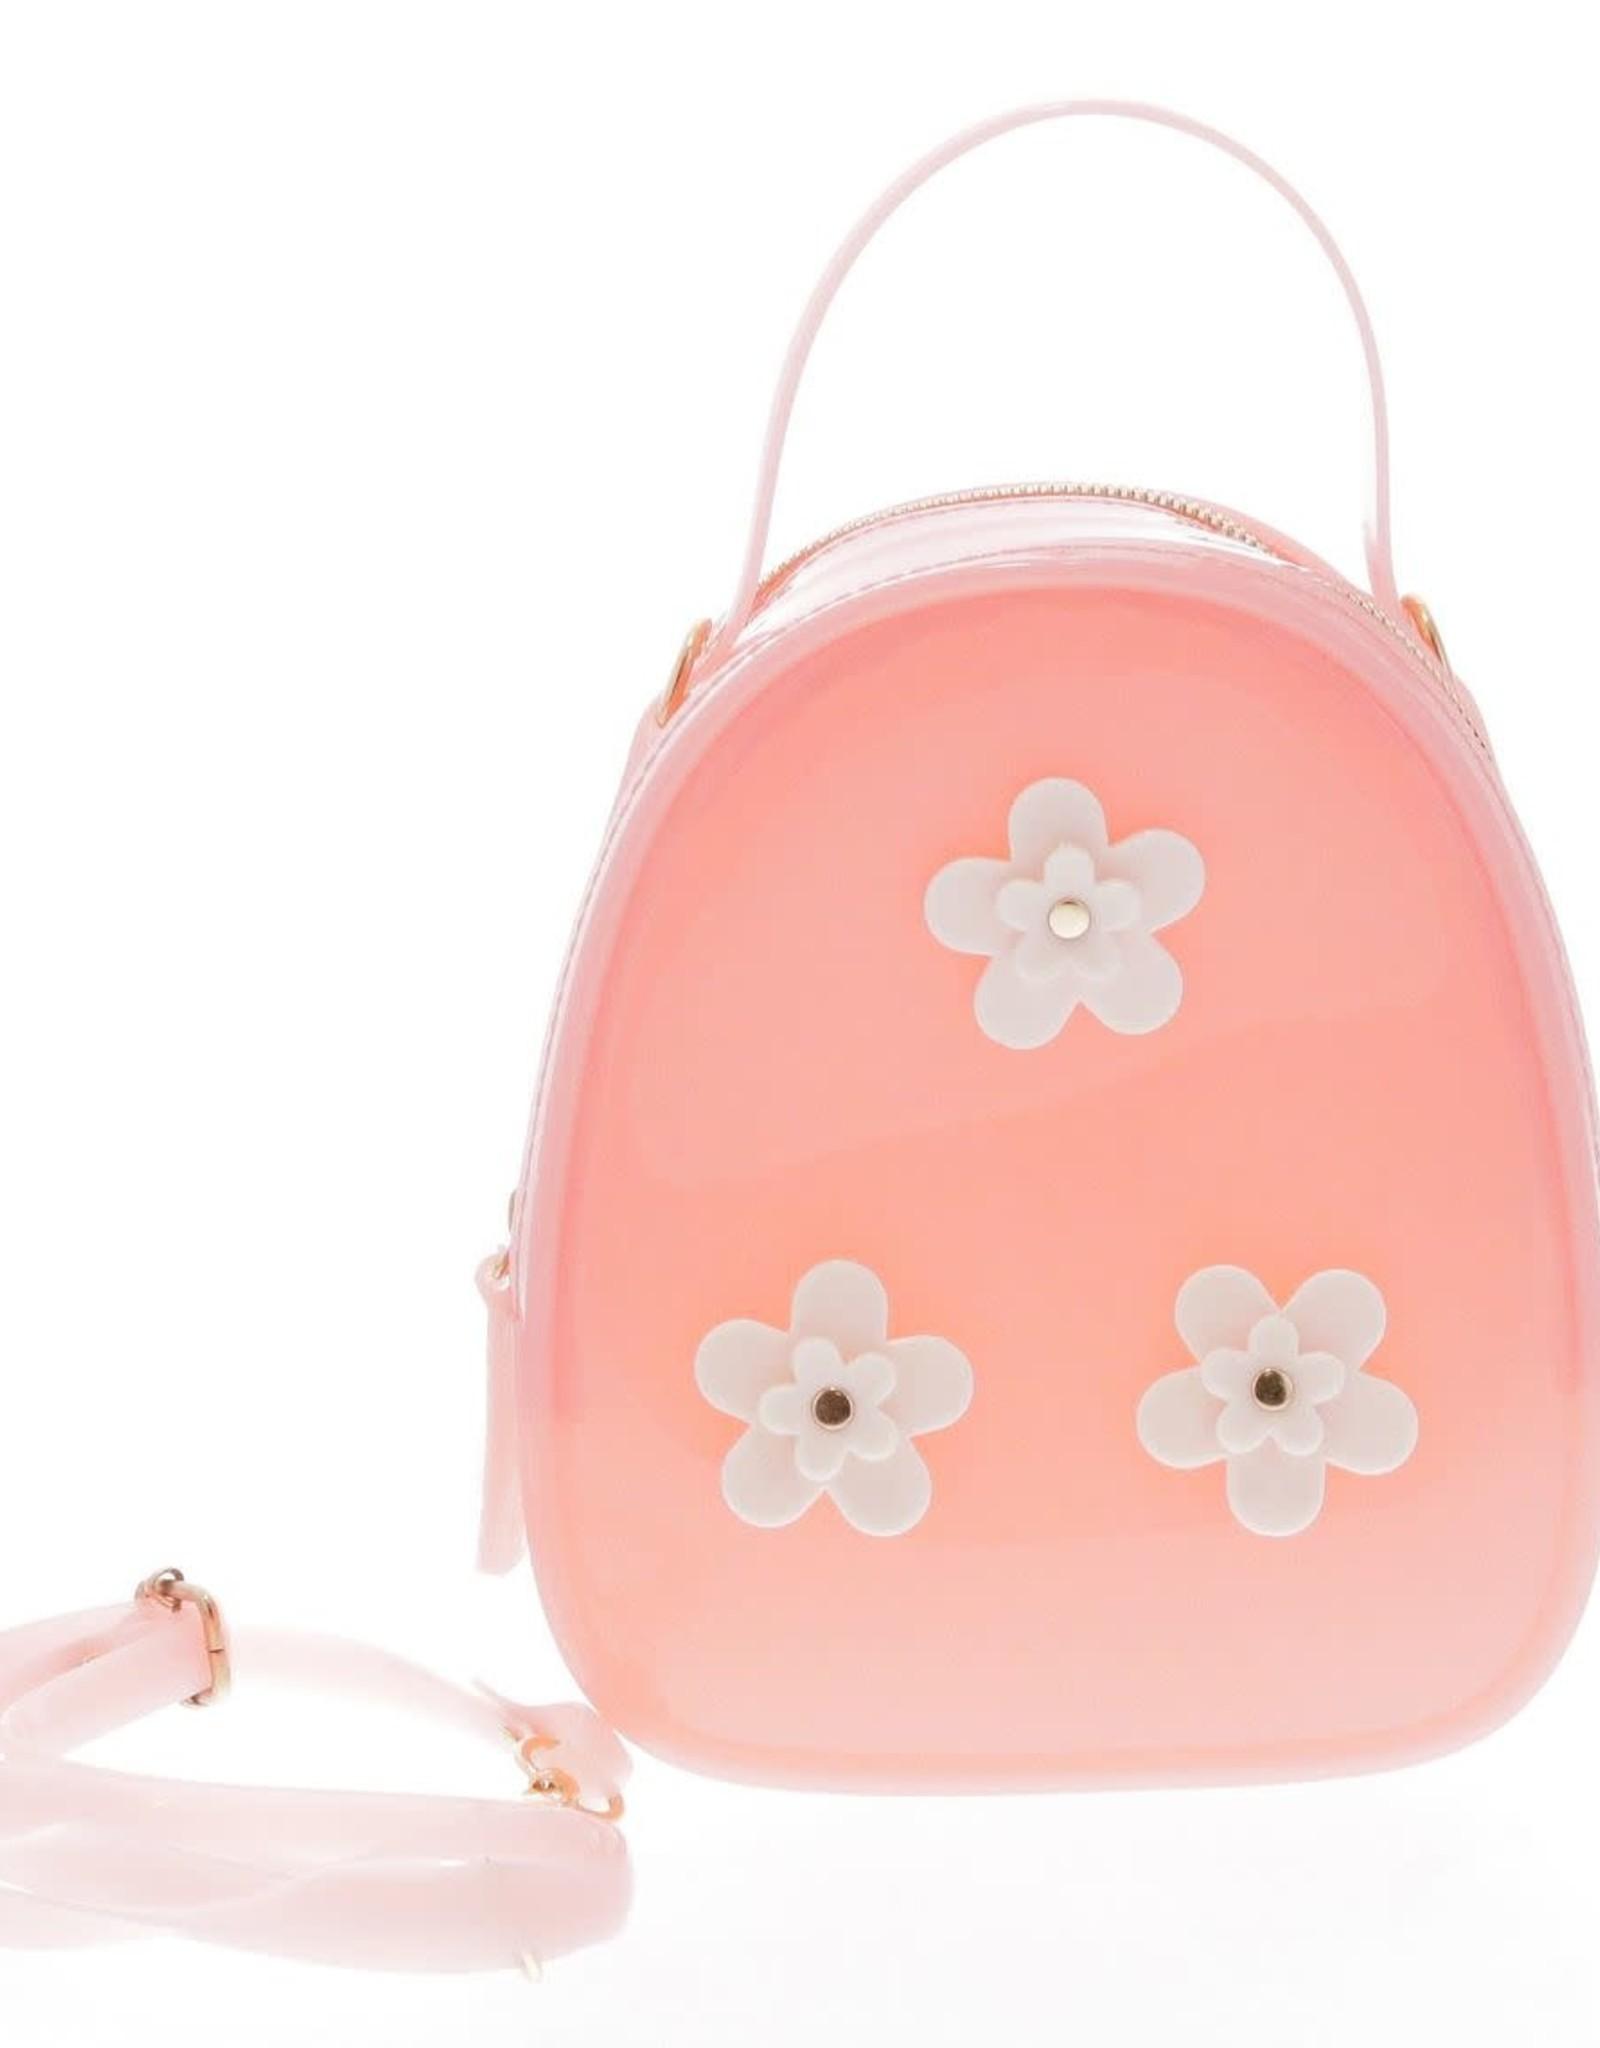 Doe a Dear Pink Floral Jelly Bag